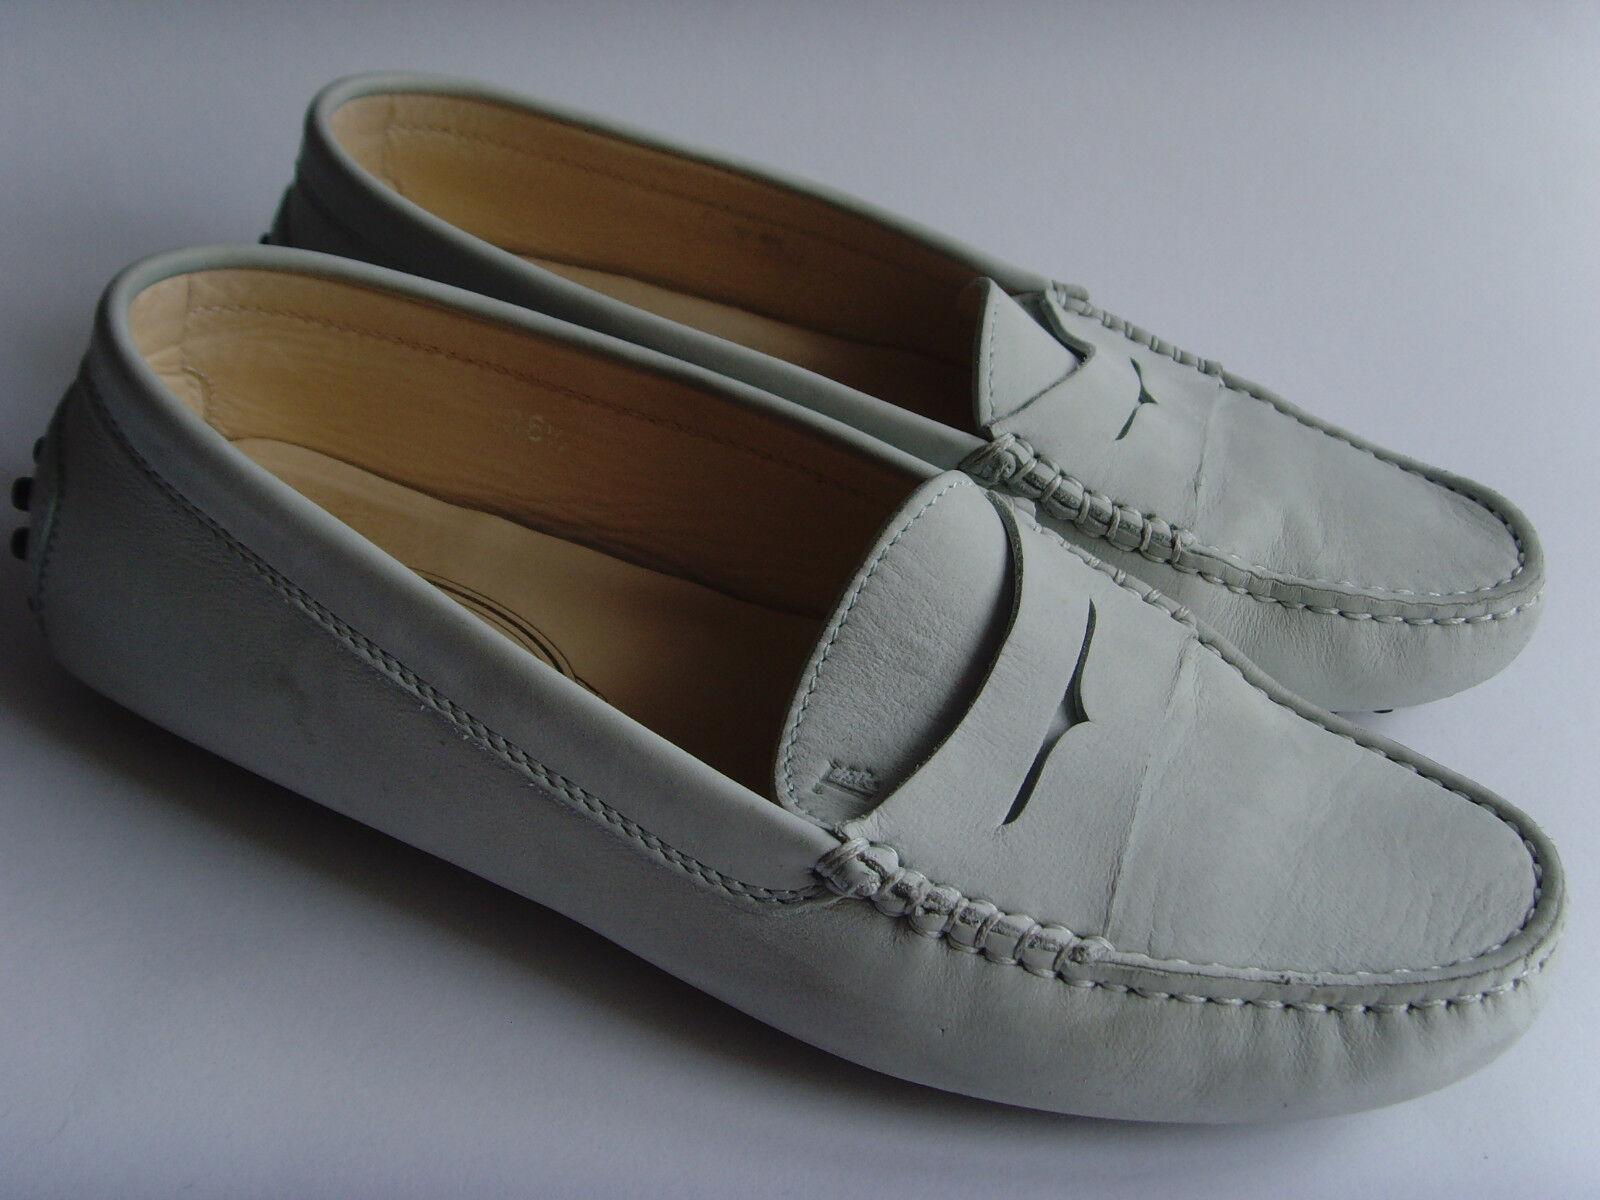 Leder Schuhe-Mokkasins - Luxus Marke - Original TOD'S - Italy - Gr.36,5